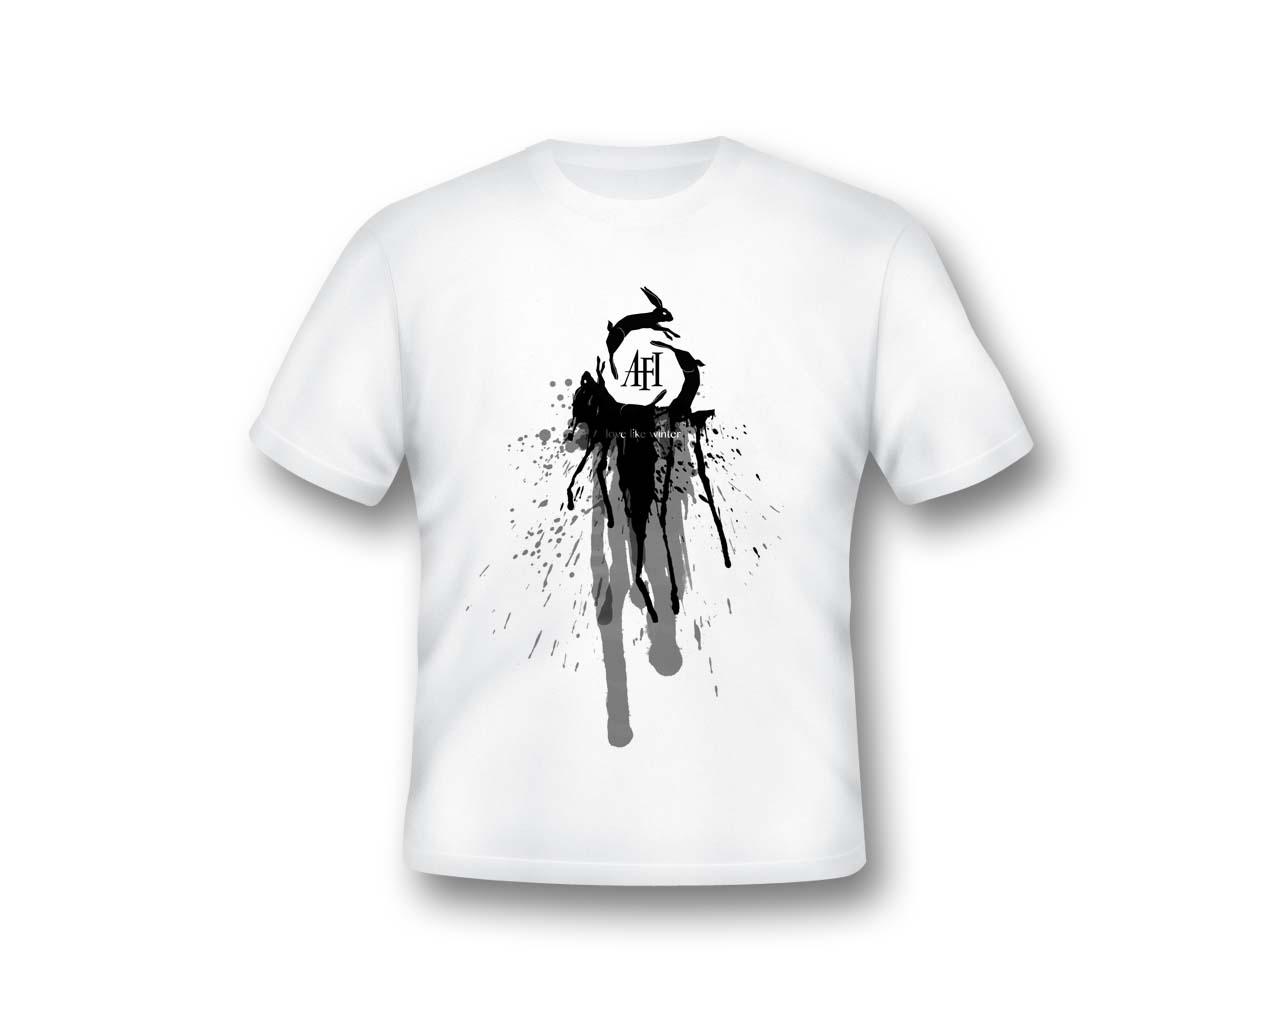 Camelfox's Logo T-Shirts Afi__love_like_winter__shirt_design_by_camelfox01-d5r977p